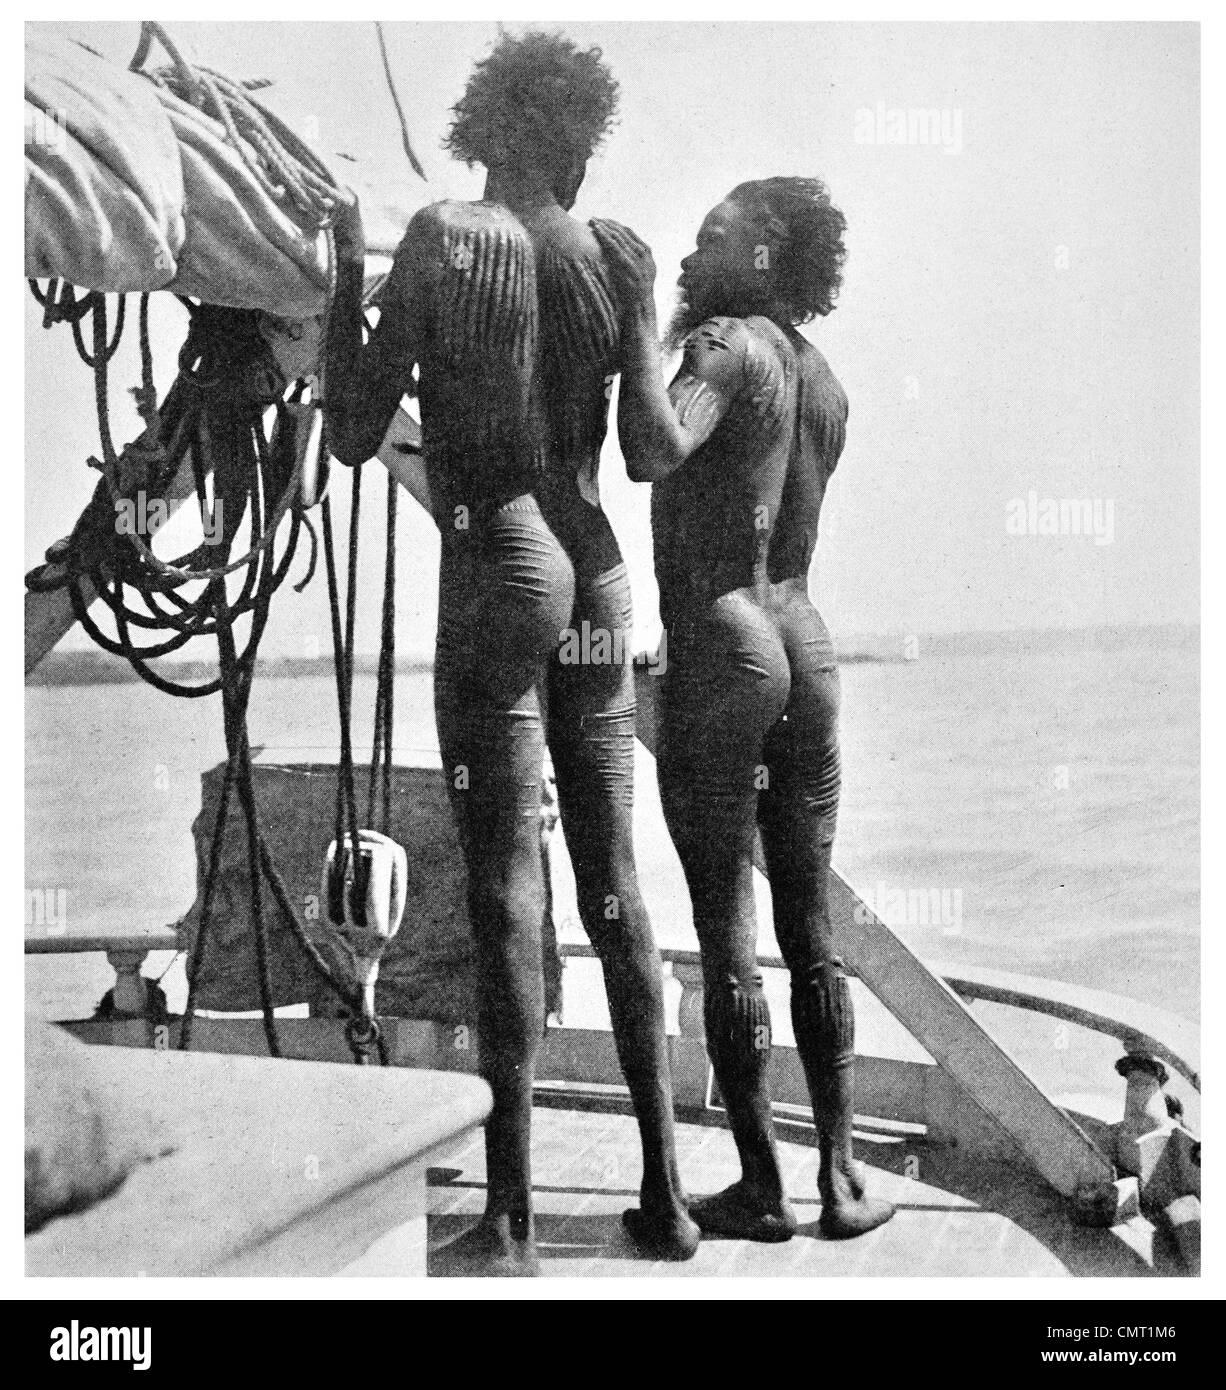 1924 Aboriginal Body Art Tattoo l'ouest de l'Australie Photo Stock